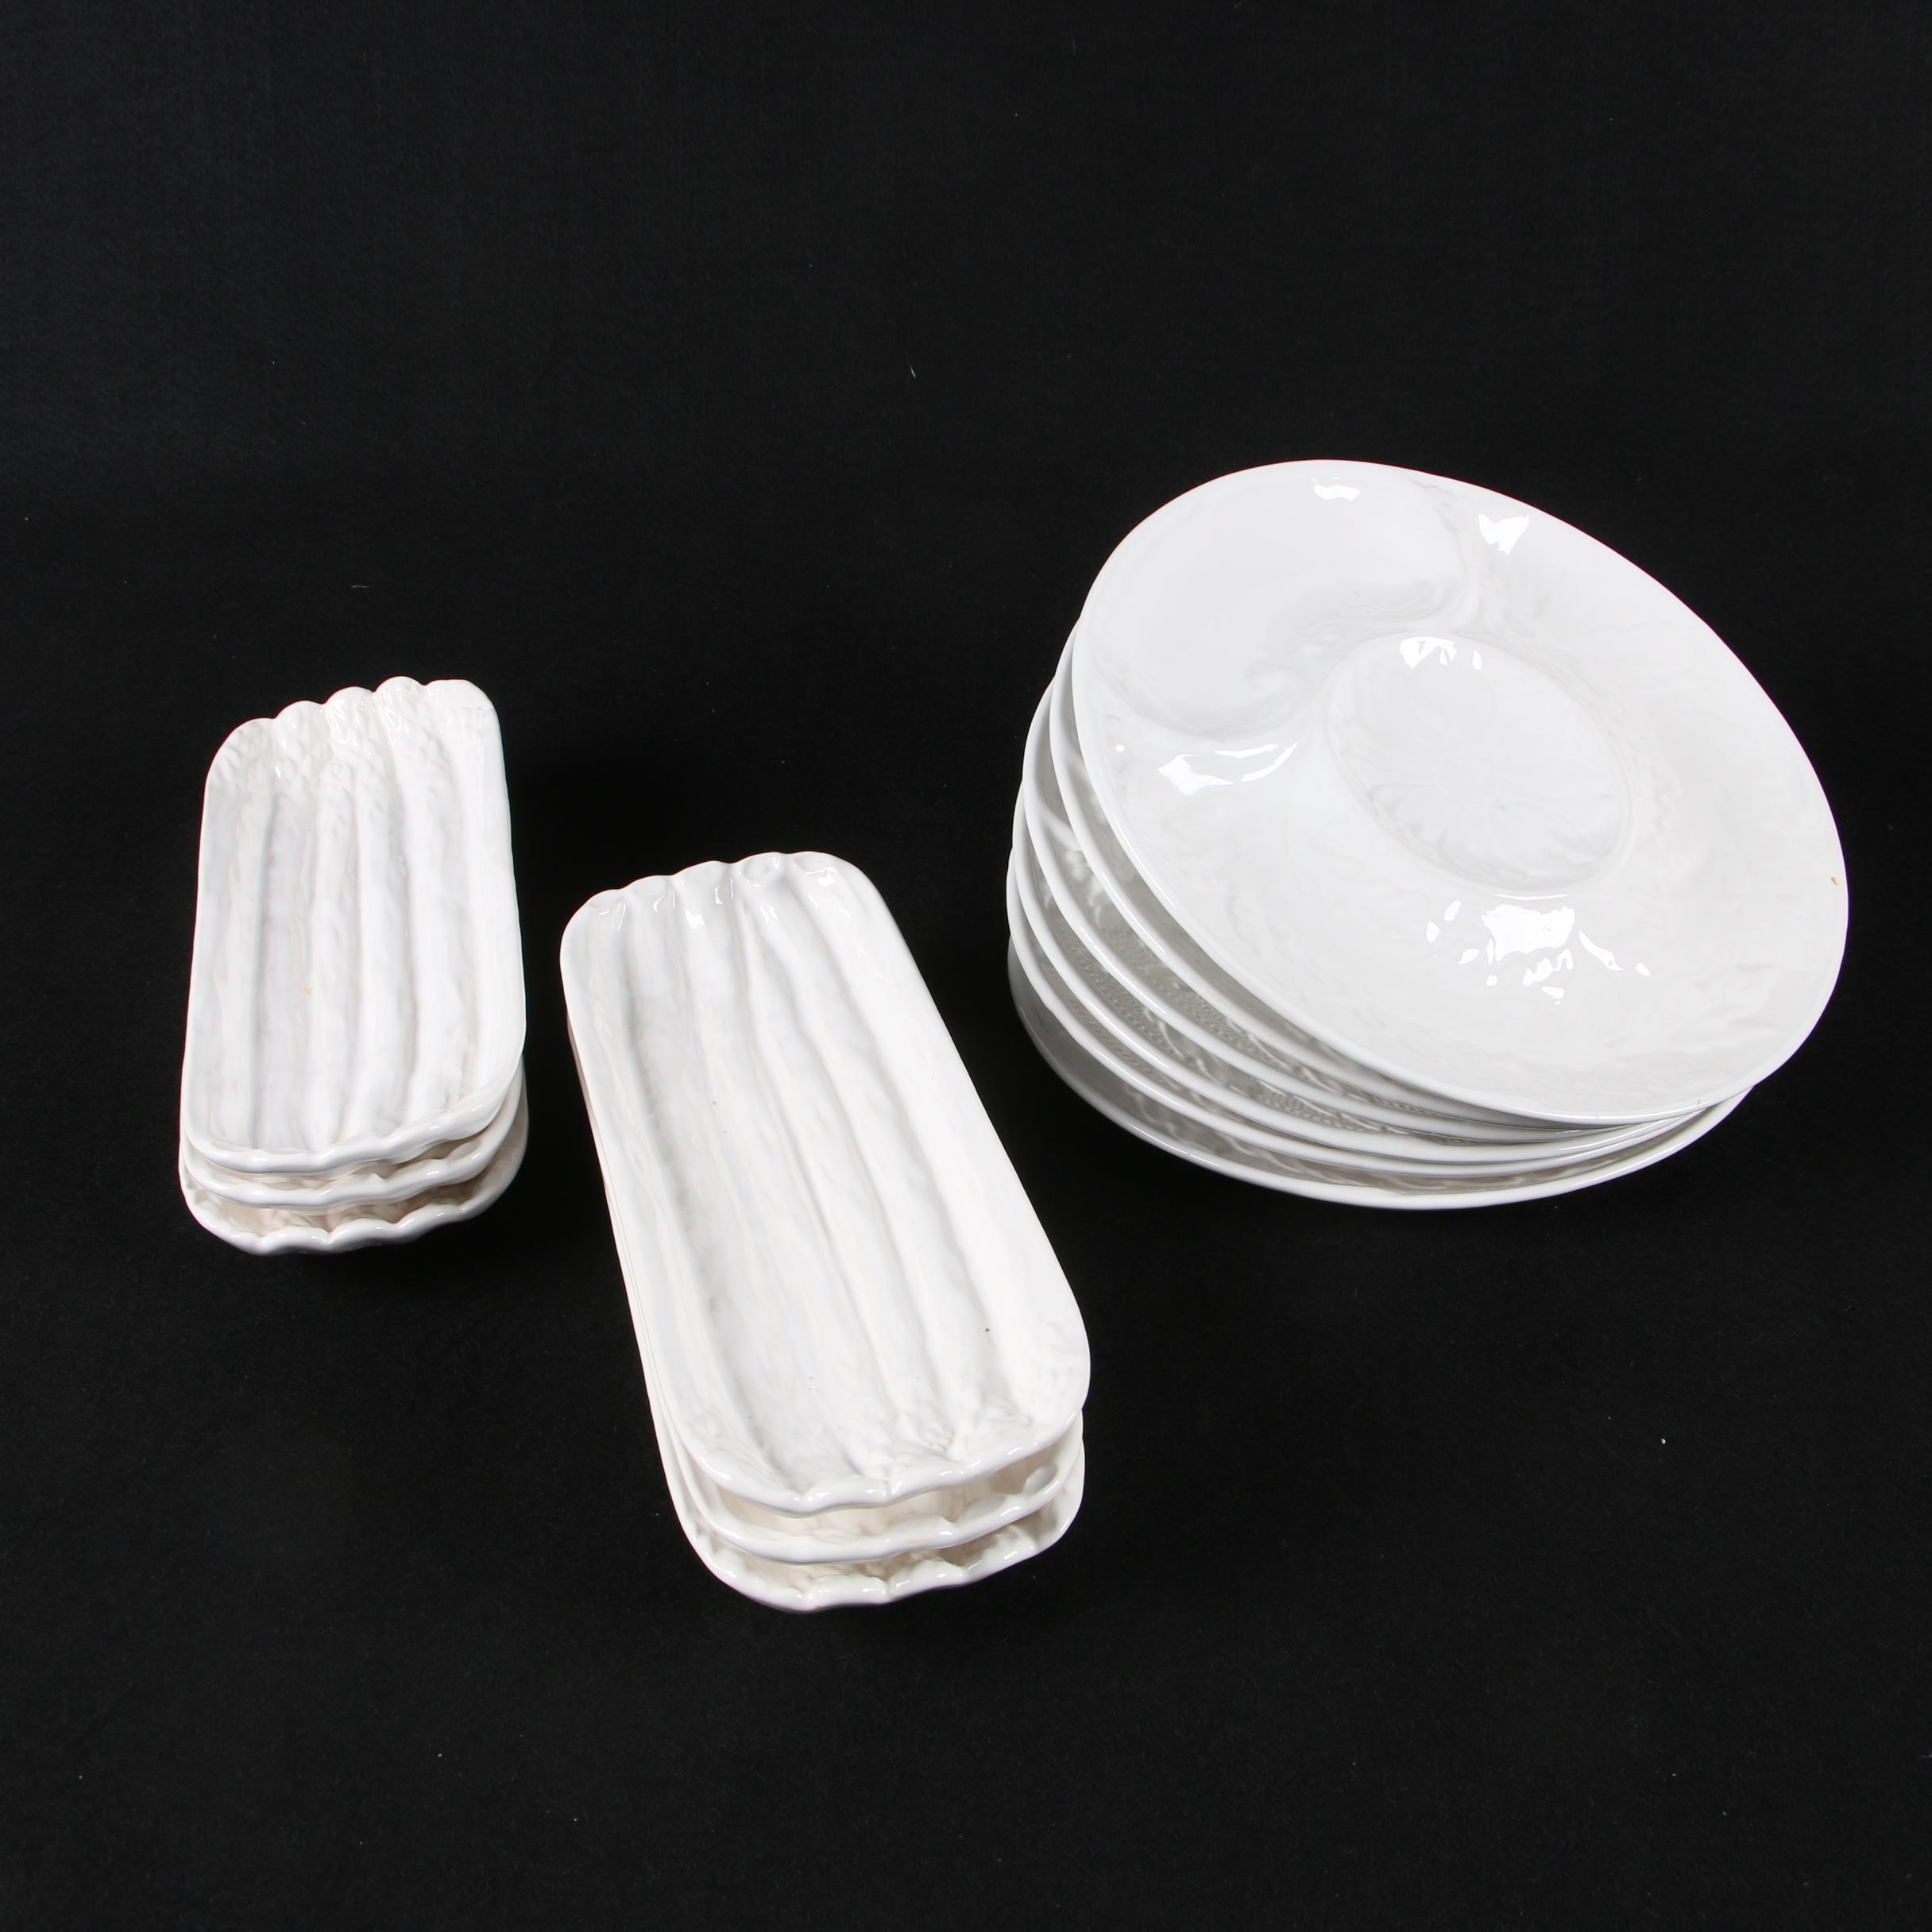 Ceramic Crudités Plates with Asparagus Trays